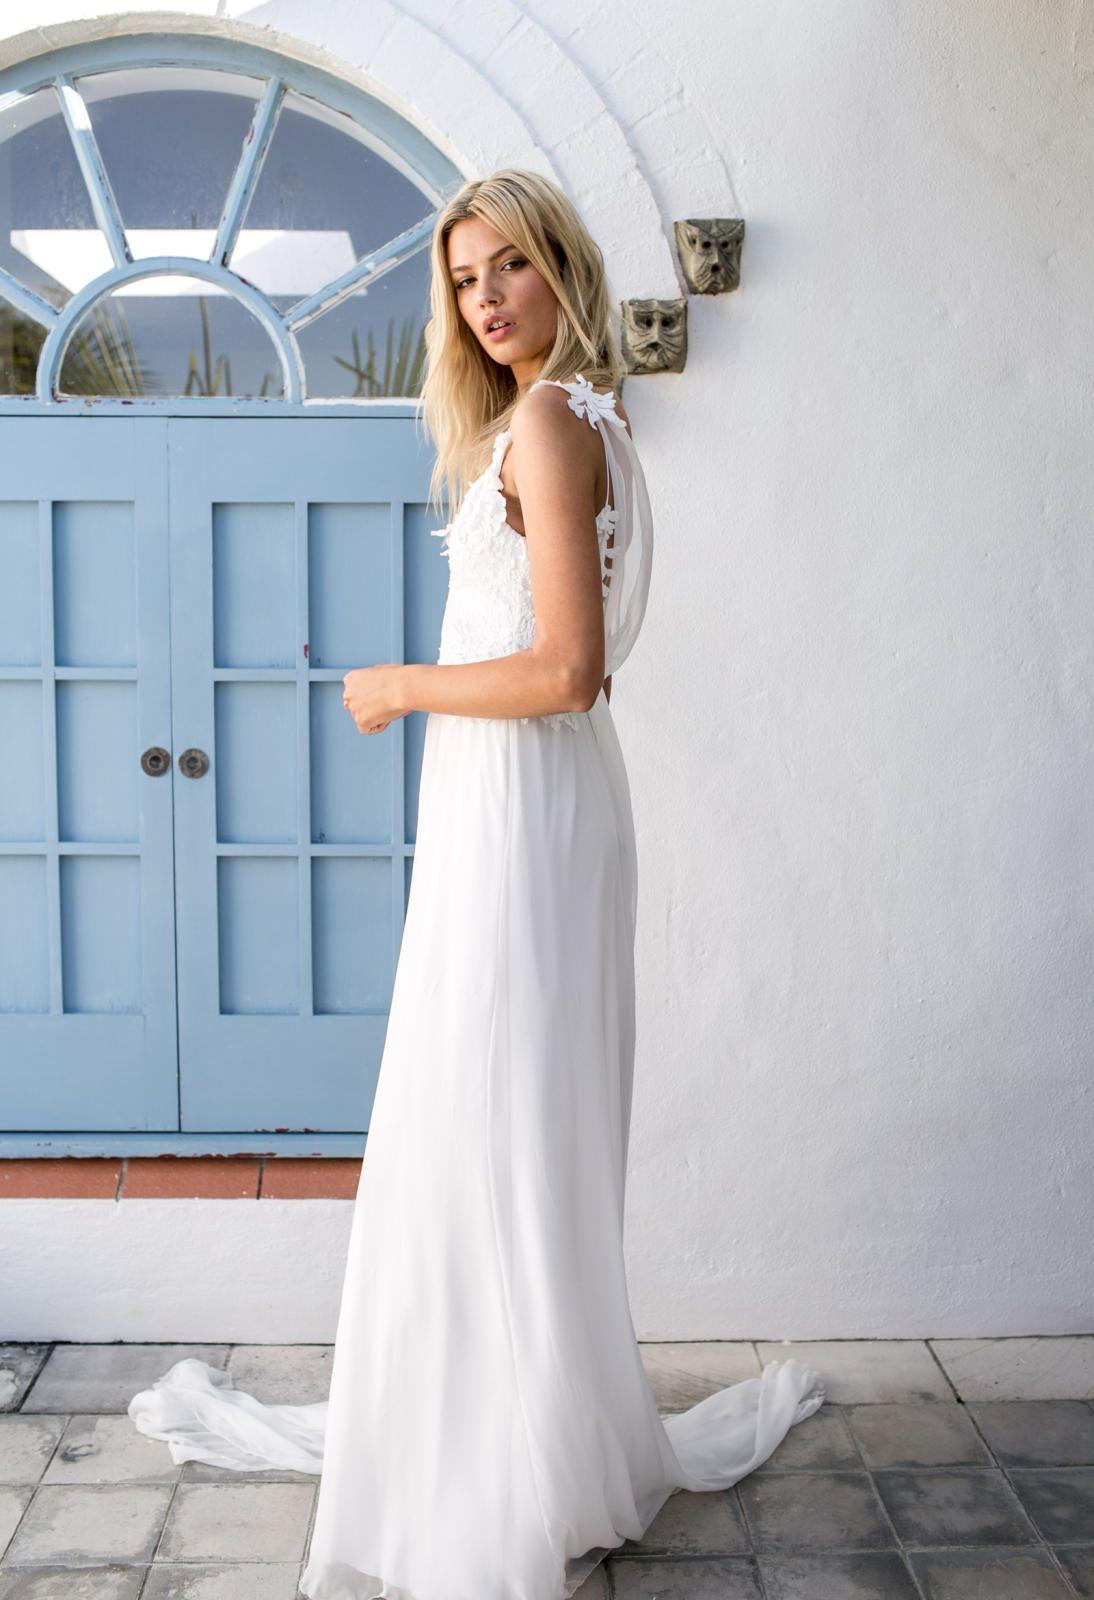 VIDA | Wedding, Destination wedding and Wedding dress